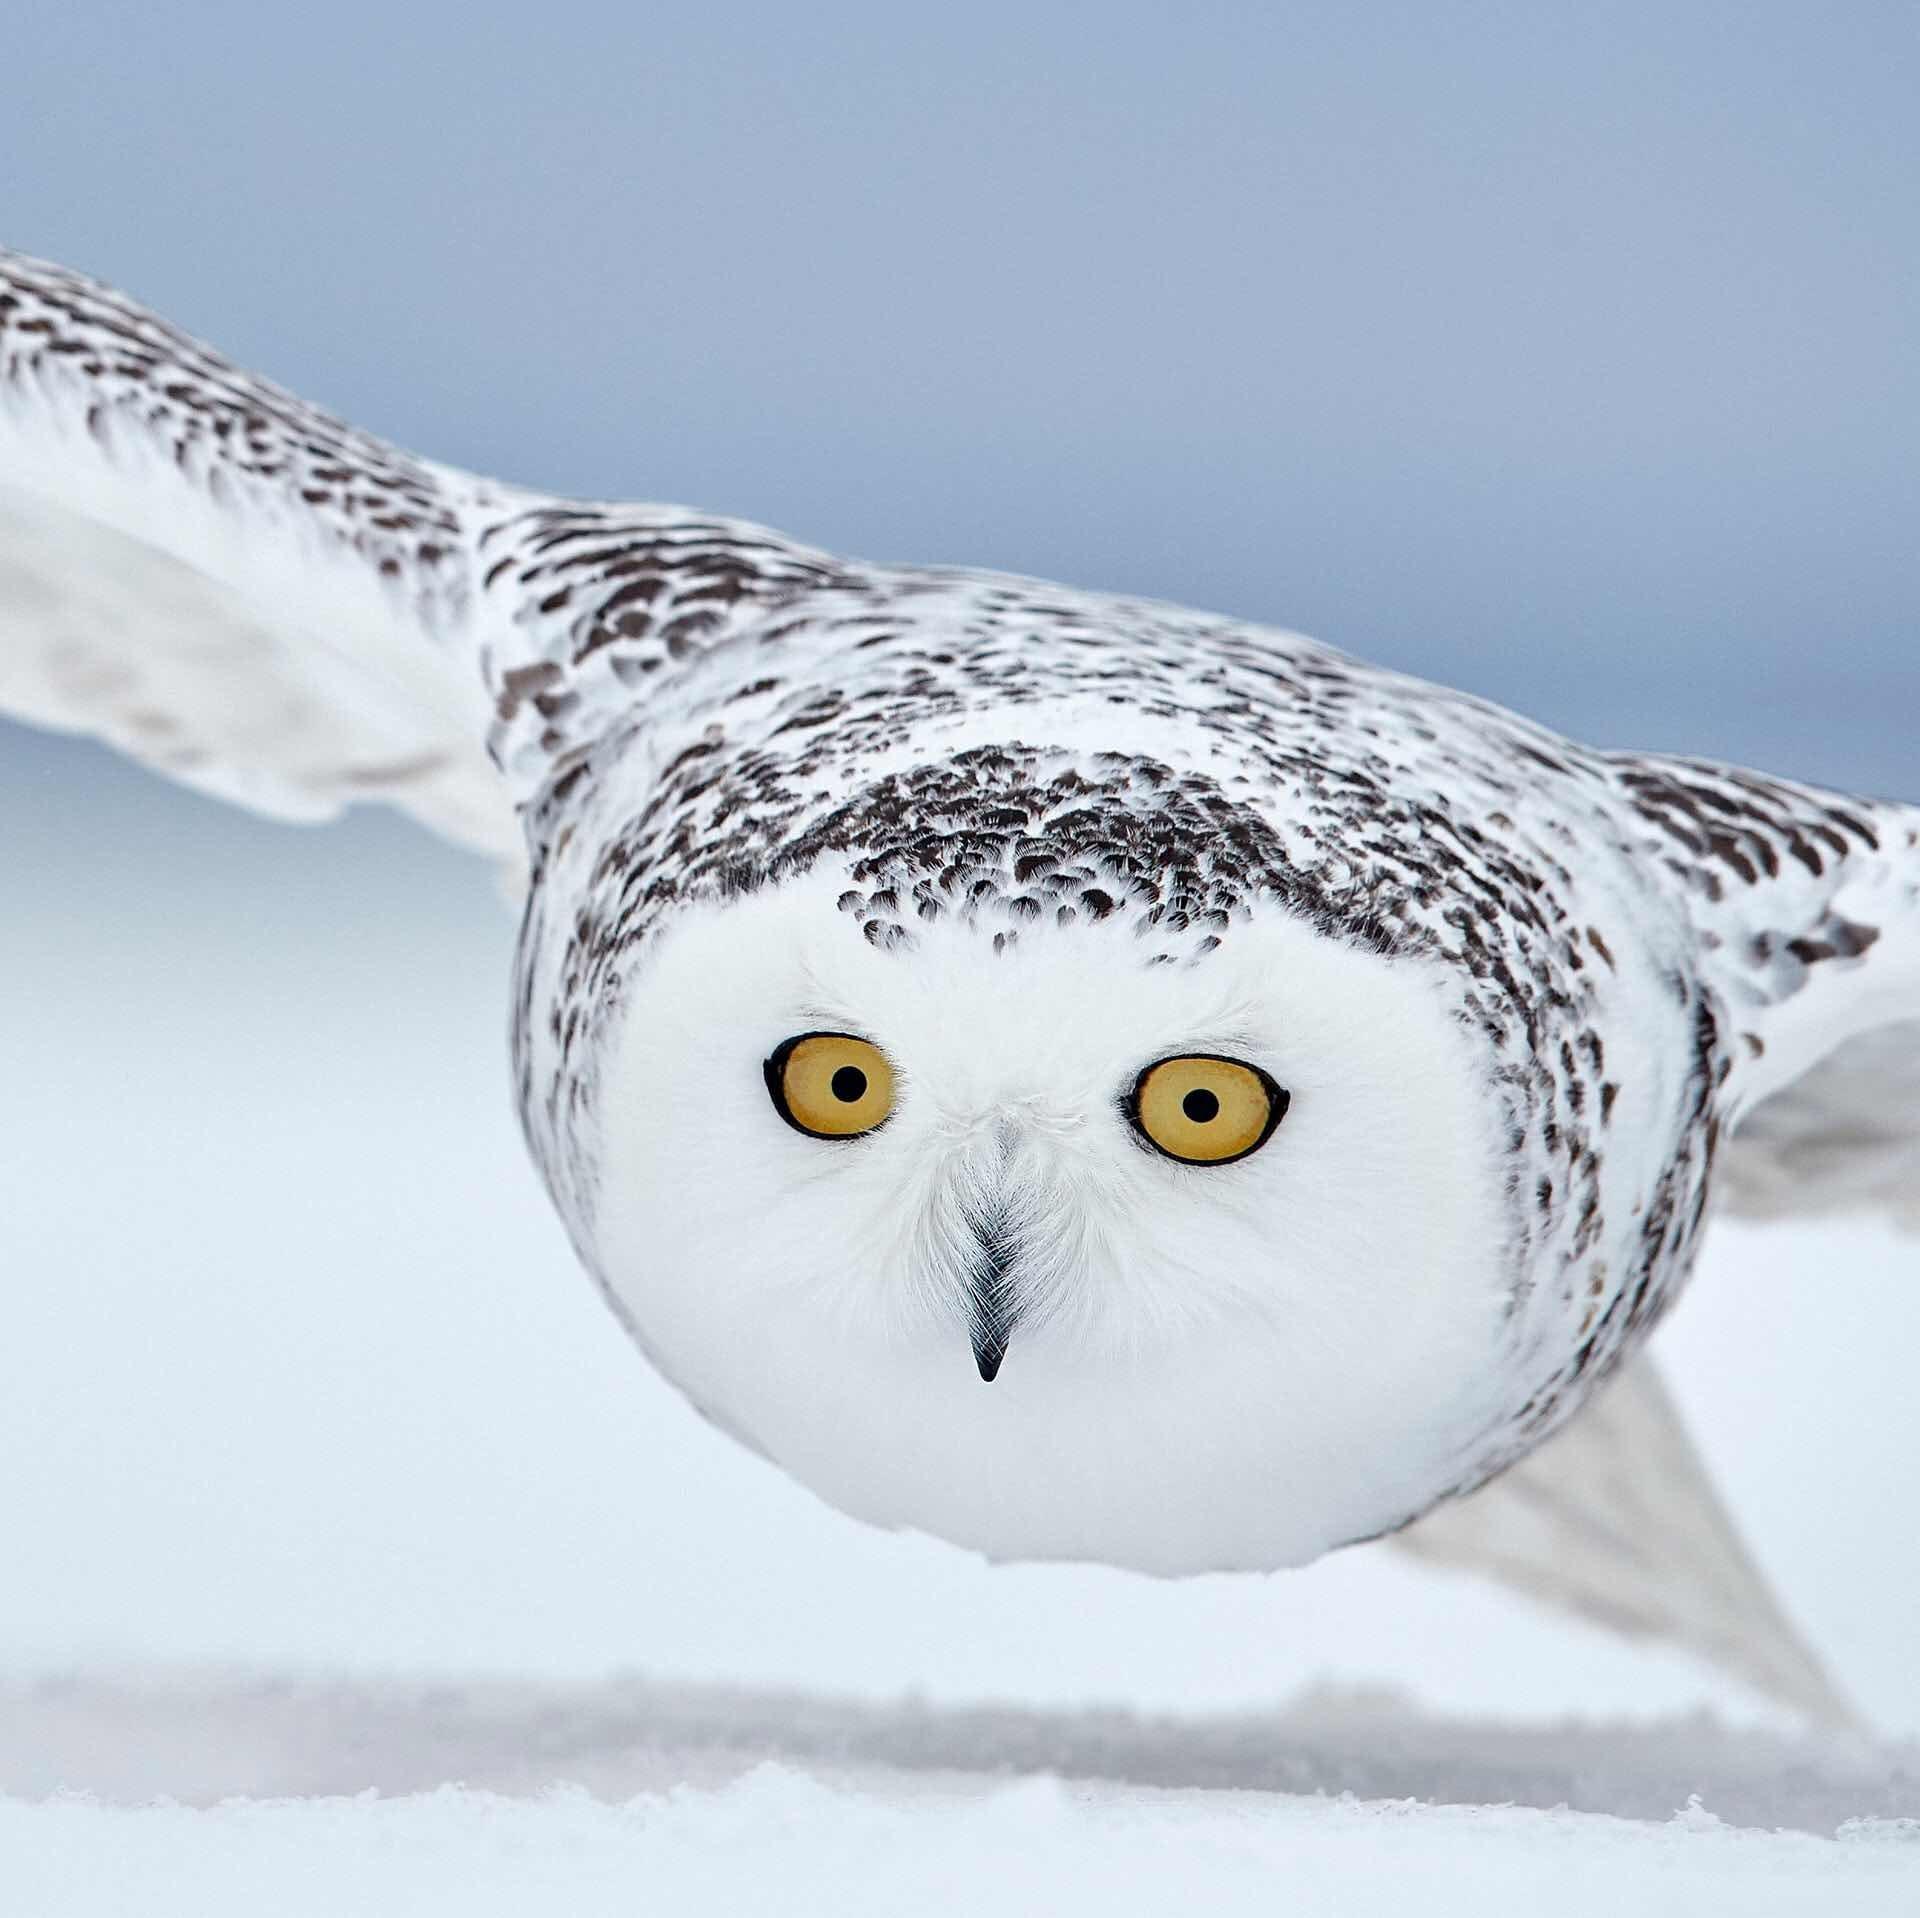 Snowy owl, CanadaPhoto: Markus Varesvuo